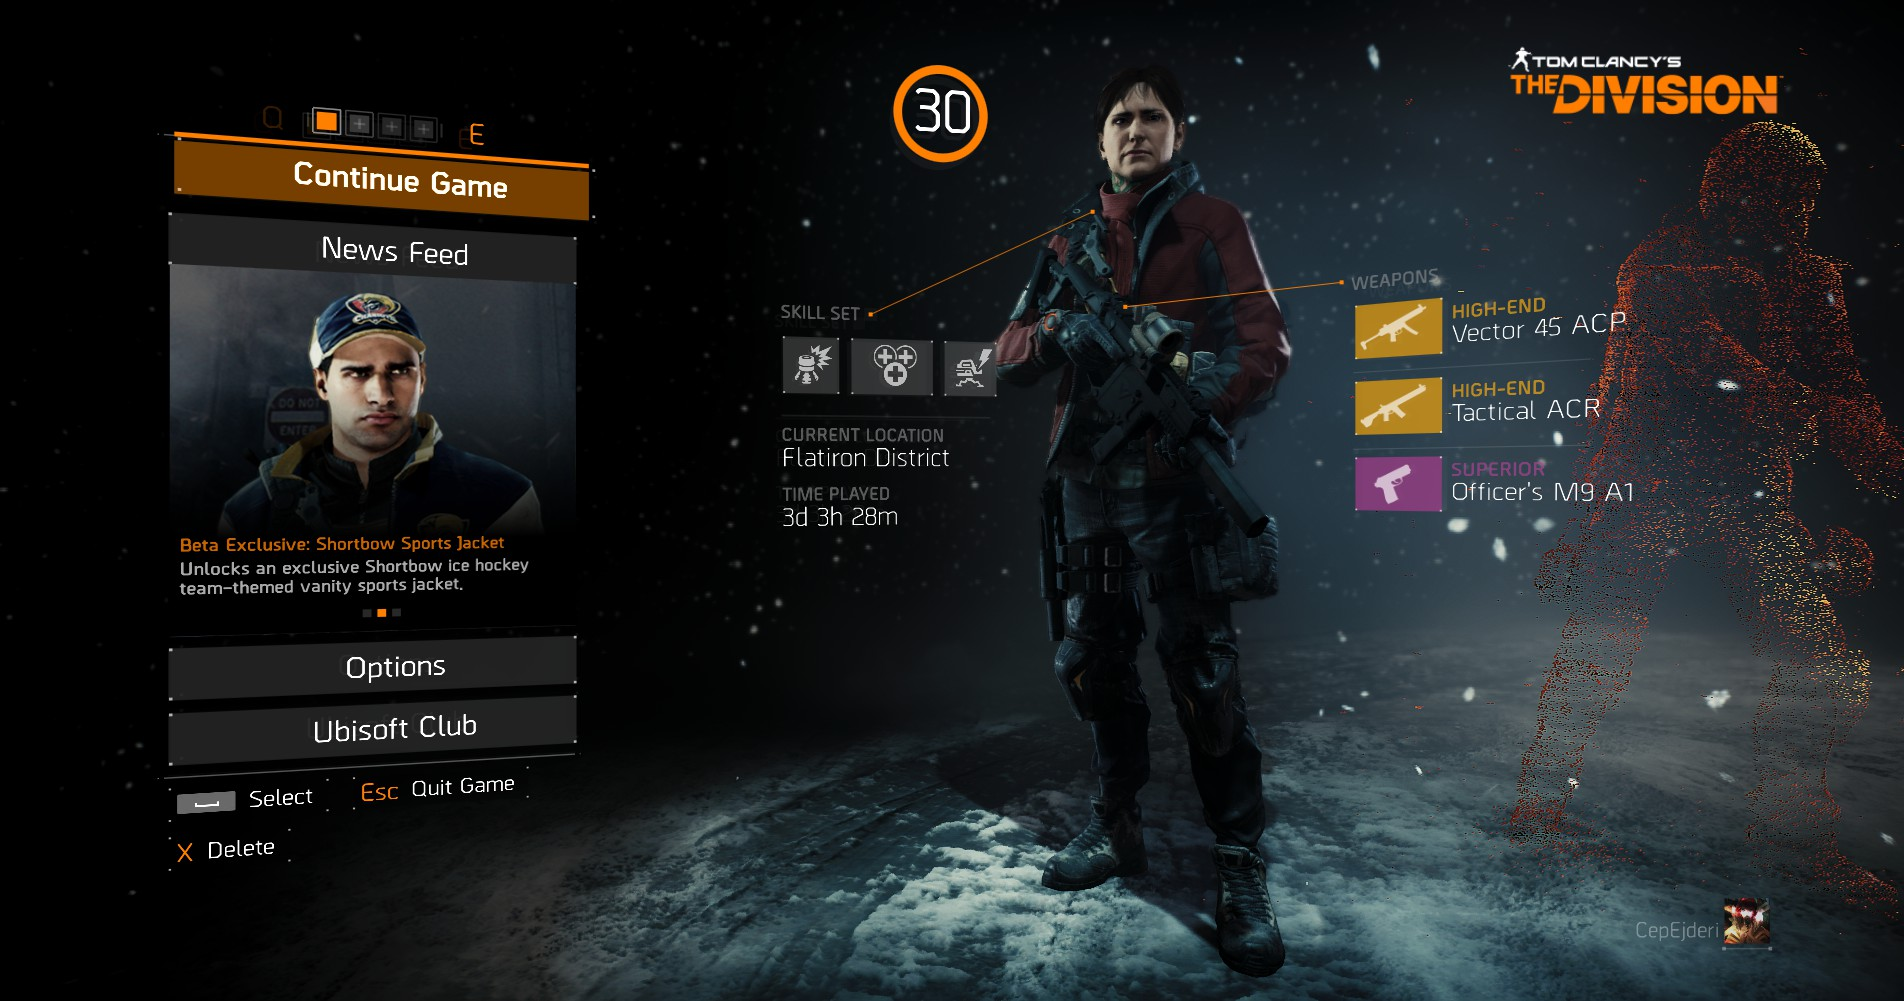 karıkoca gaming Tom Clancy's The Division İnceleme (2)